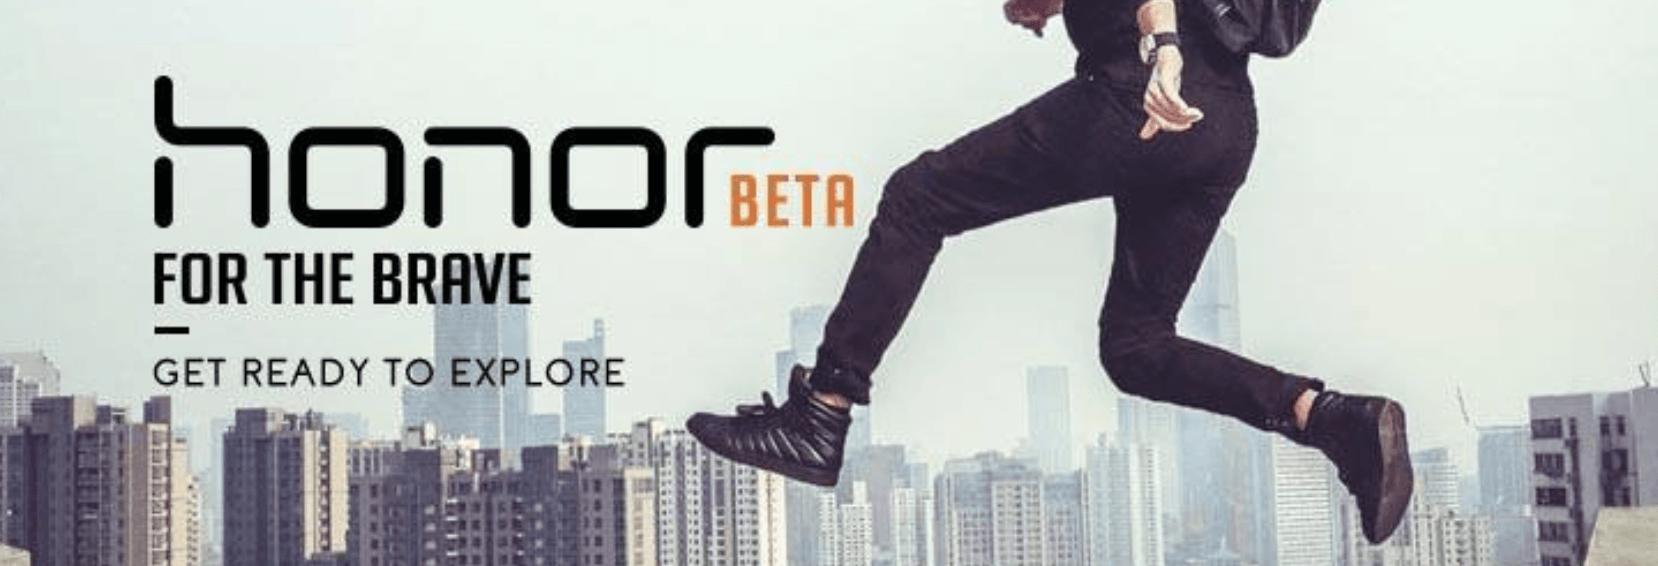 Tech'spresso : Honor Beta, du nouveau sur Gboard et Xiaomi Mi 6